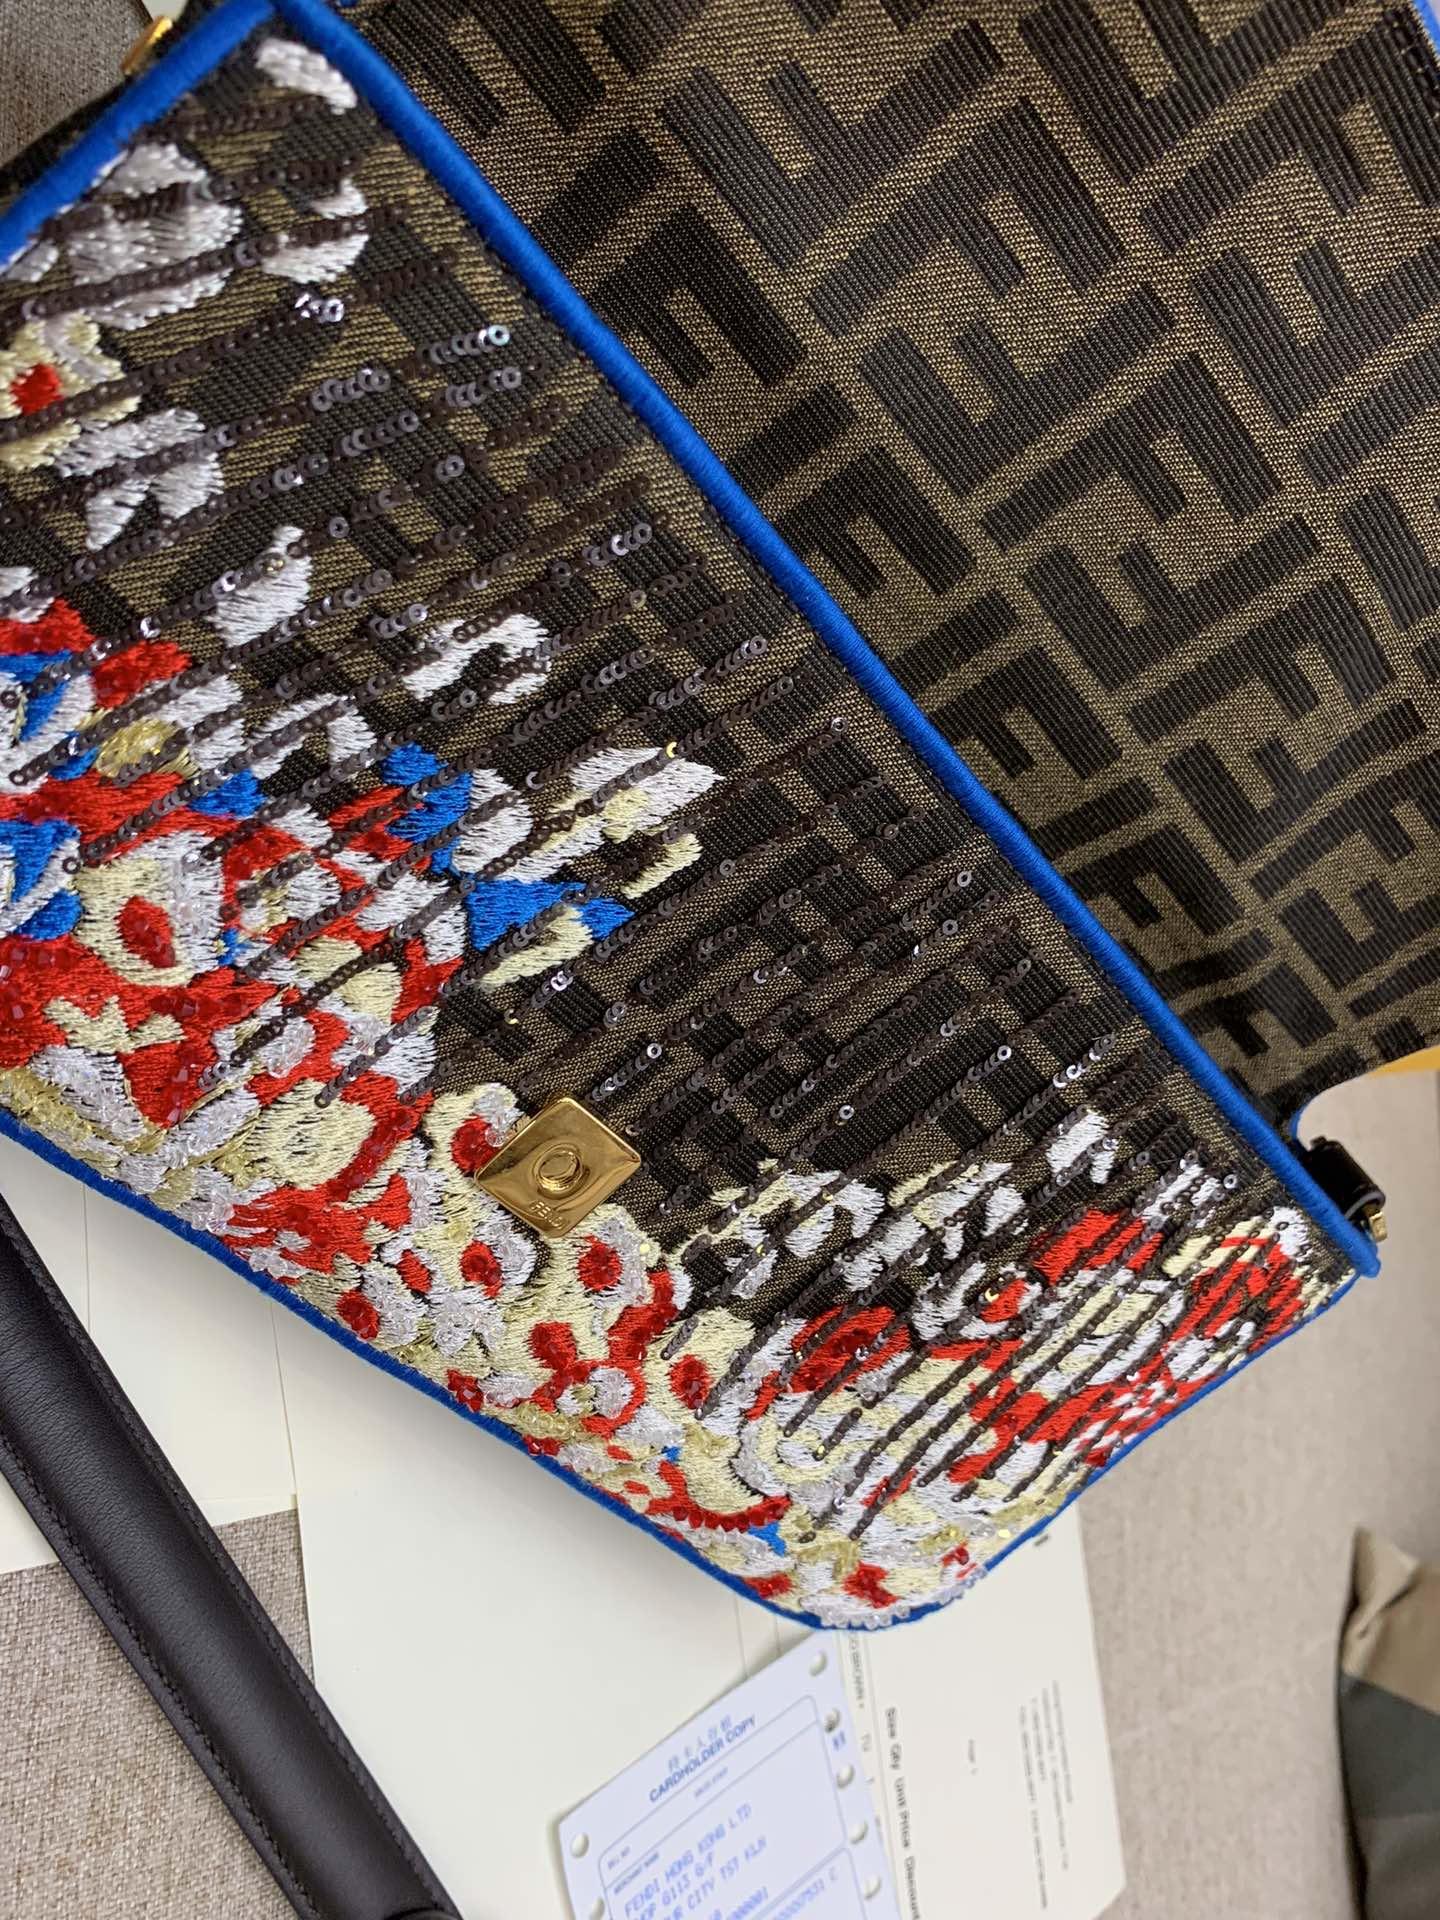 FENDI现货 Baguette 最经典的包款 翻盖设计 内衬配有拉链袋 饰有日落图案缝线刺绣亮片和饰珠 26cm 8012